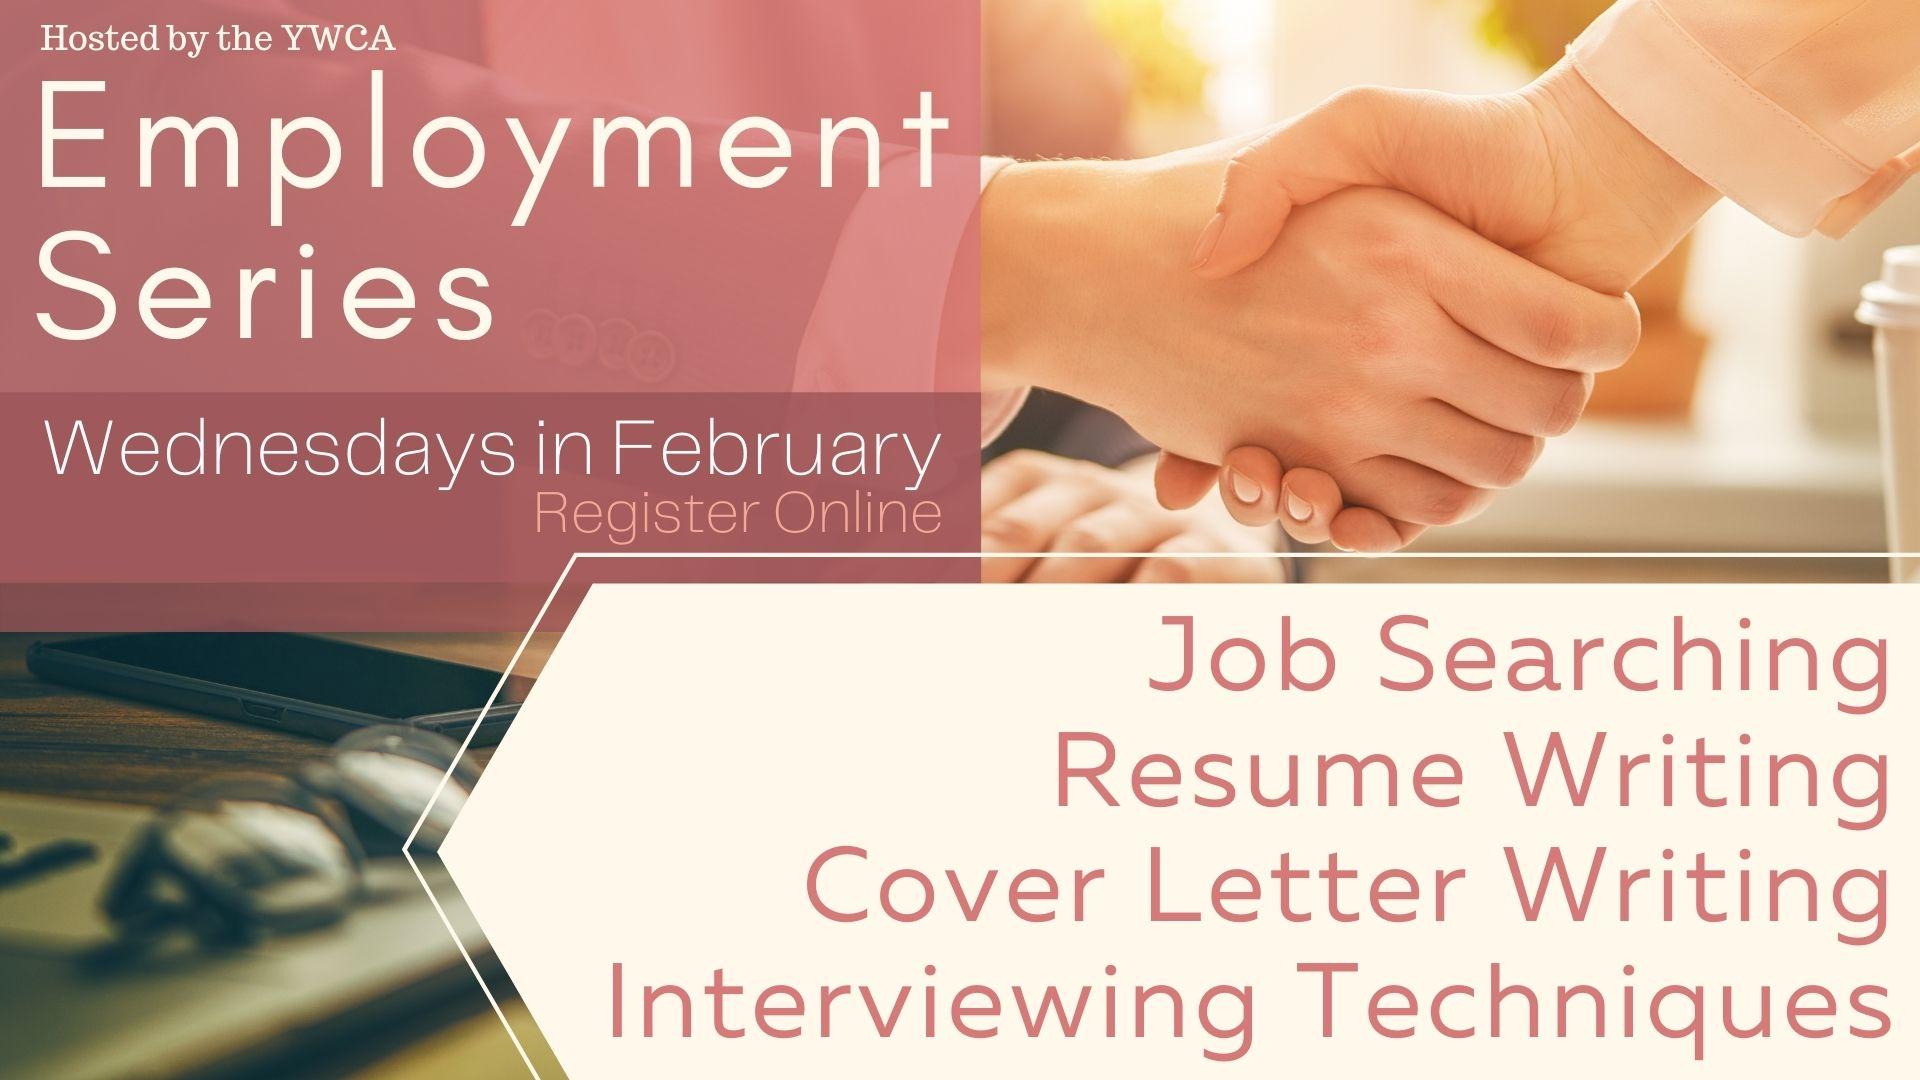 YWCA Employment Series: Resume Writing